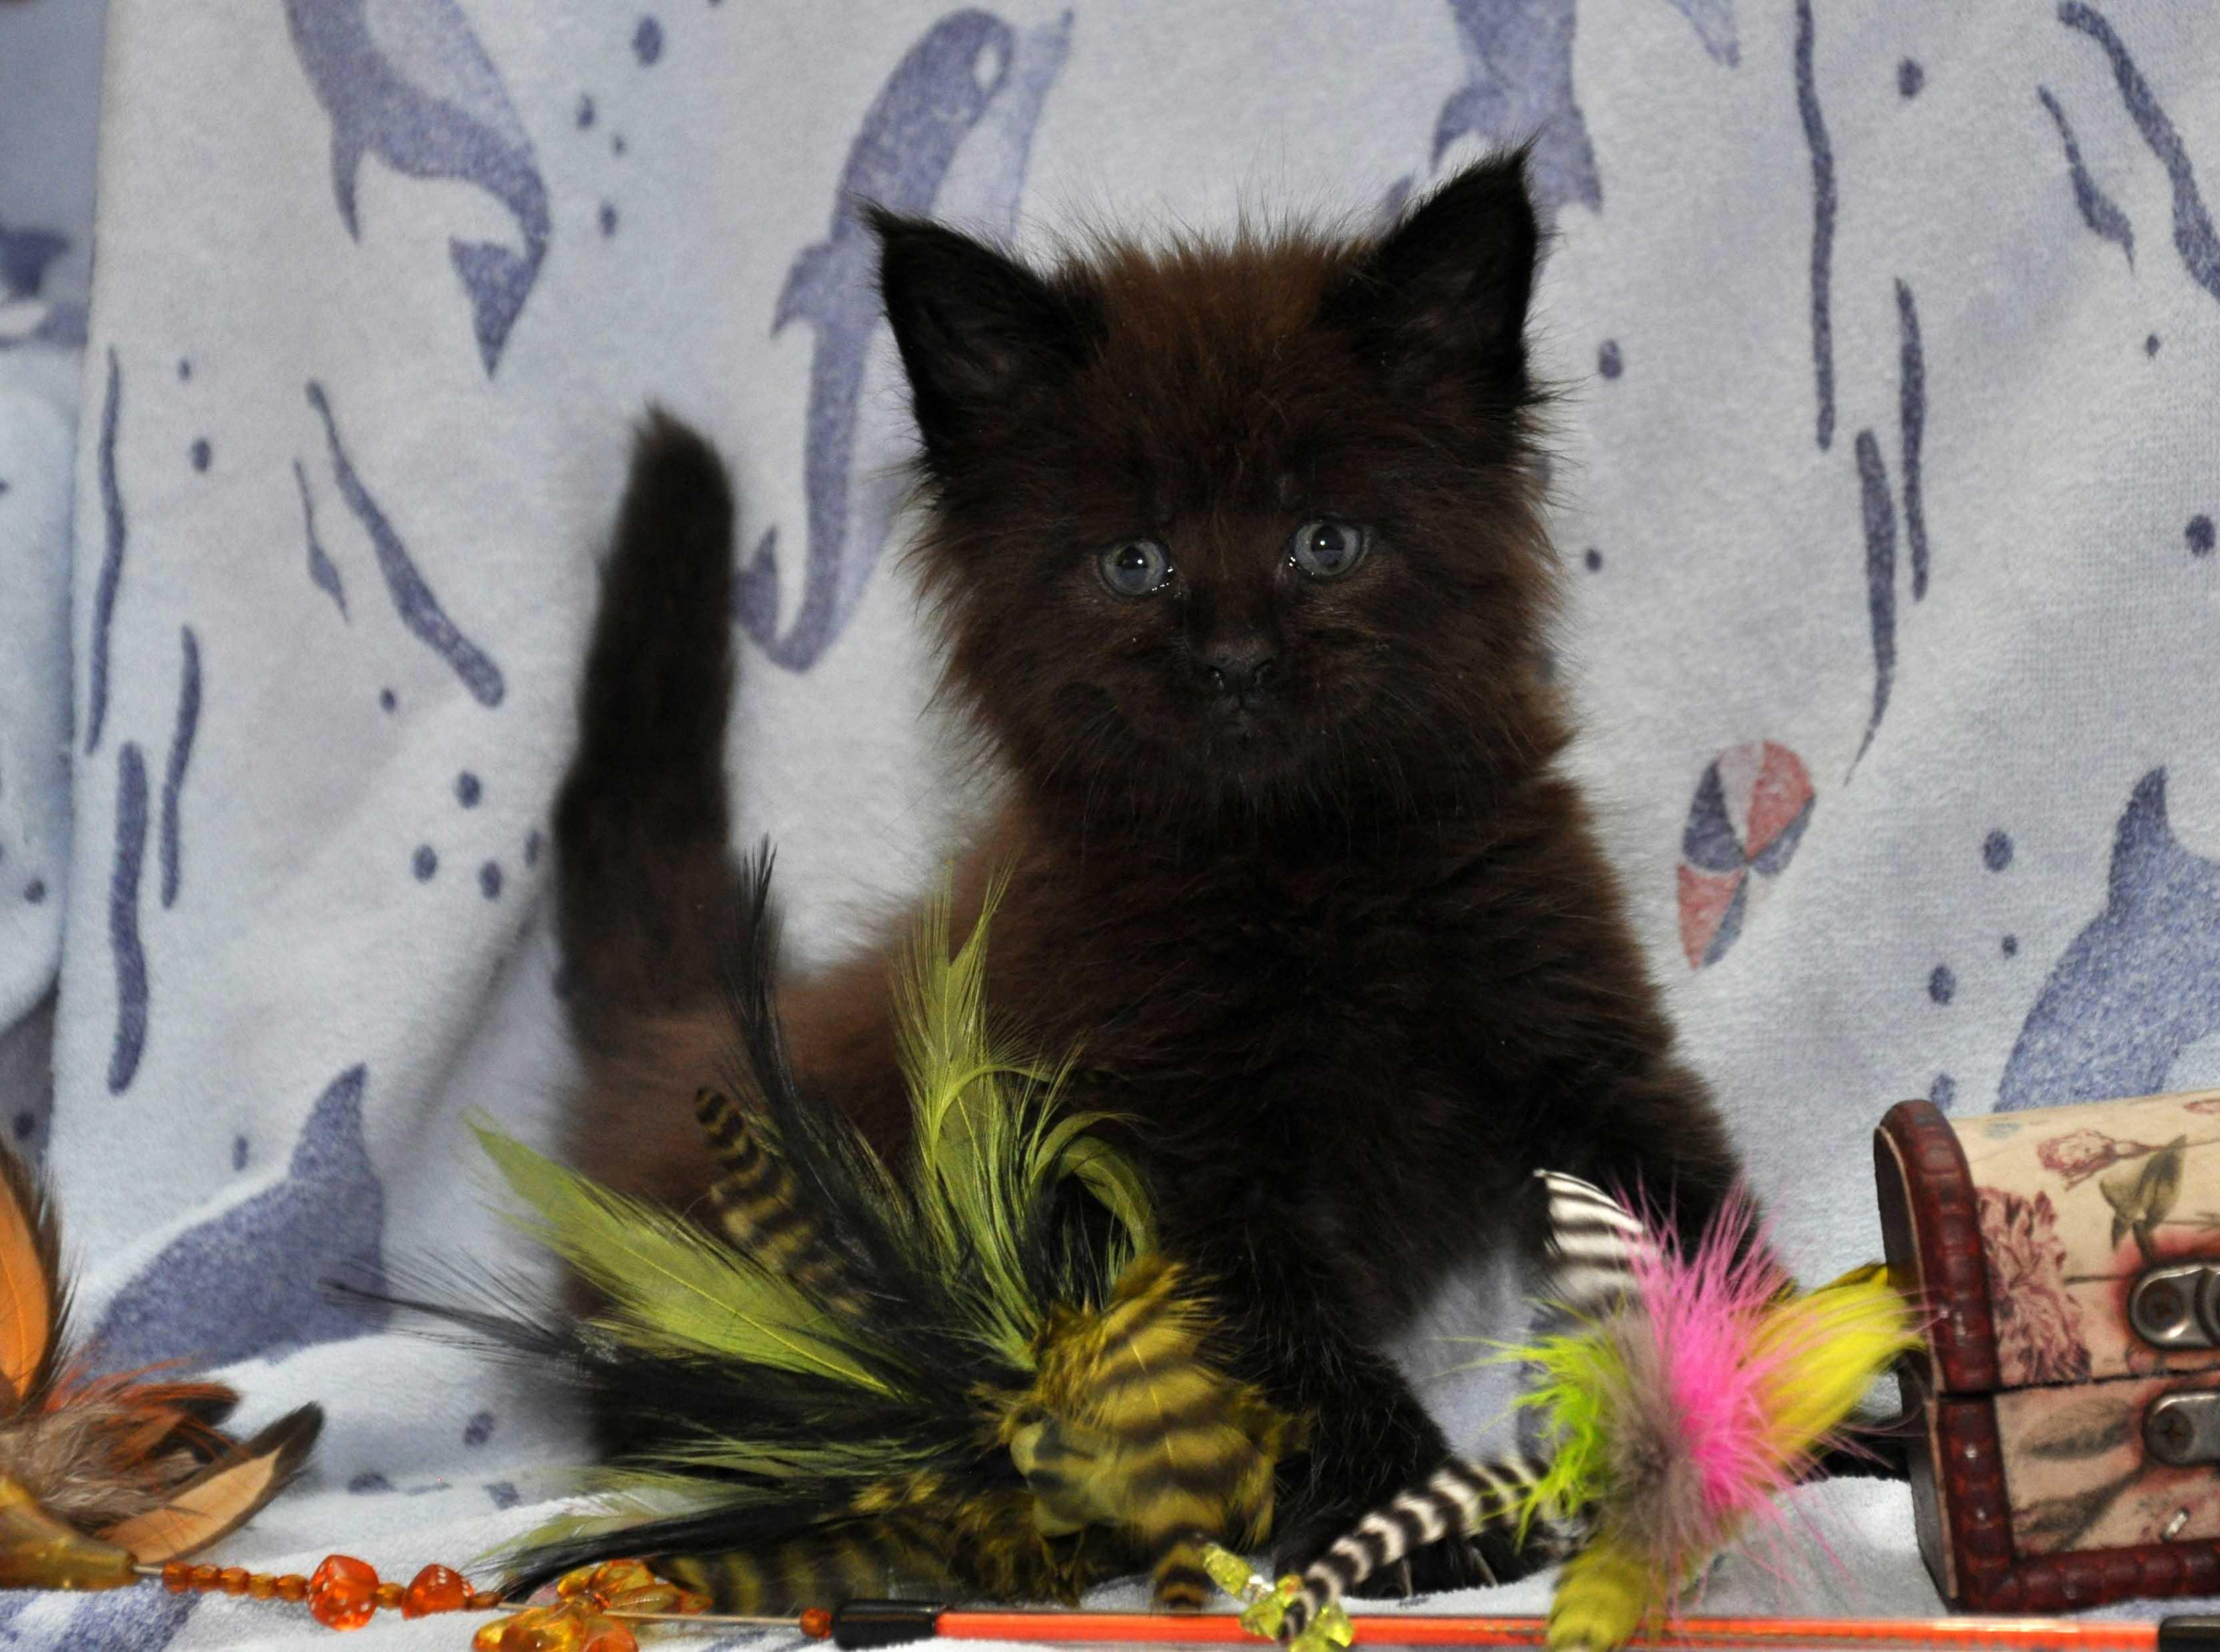 Кот Мейн Кун 3 (male) Eyktan QUAKE фото 5